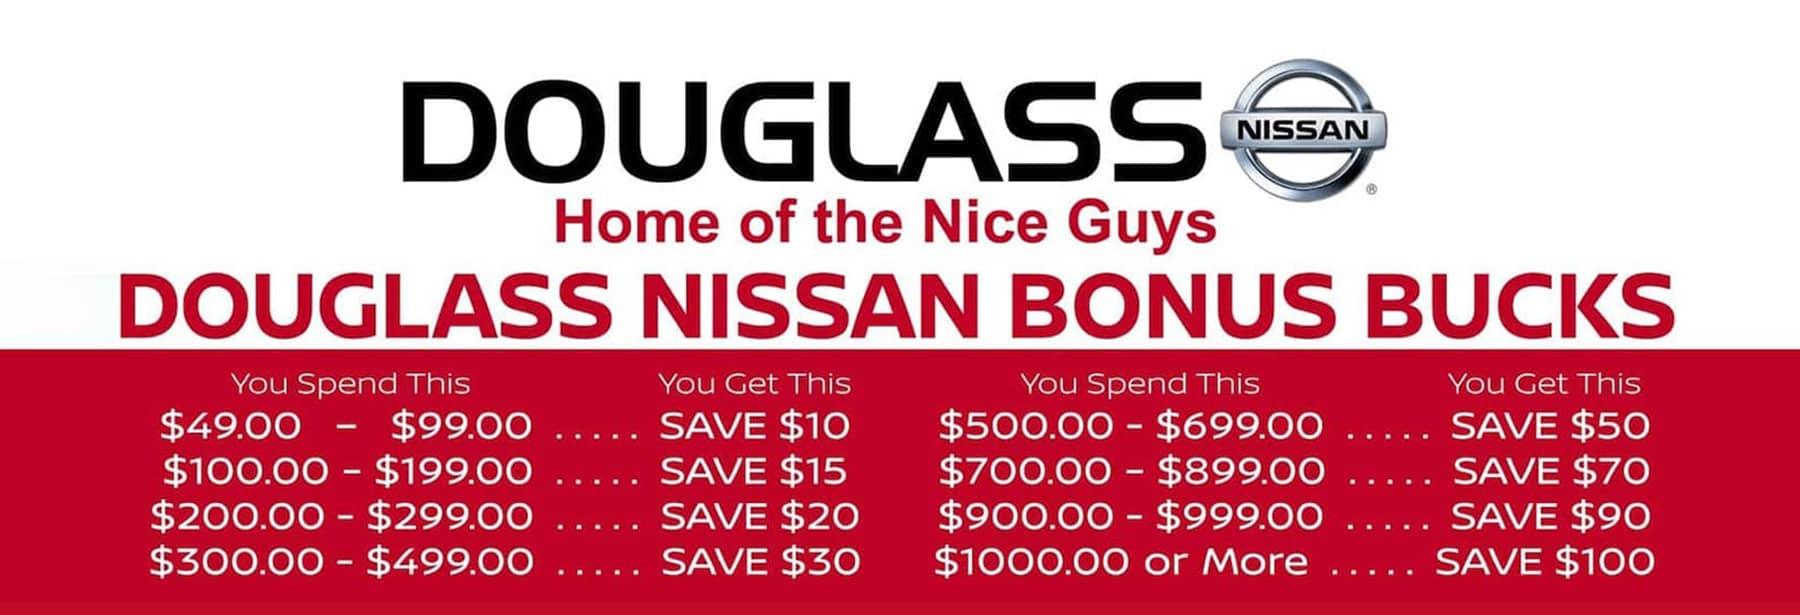 Nissan Bonus Bucks